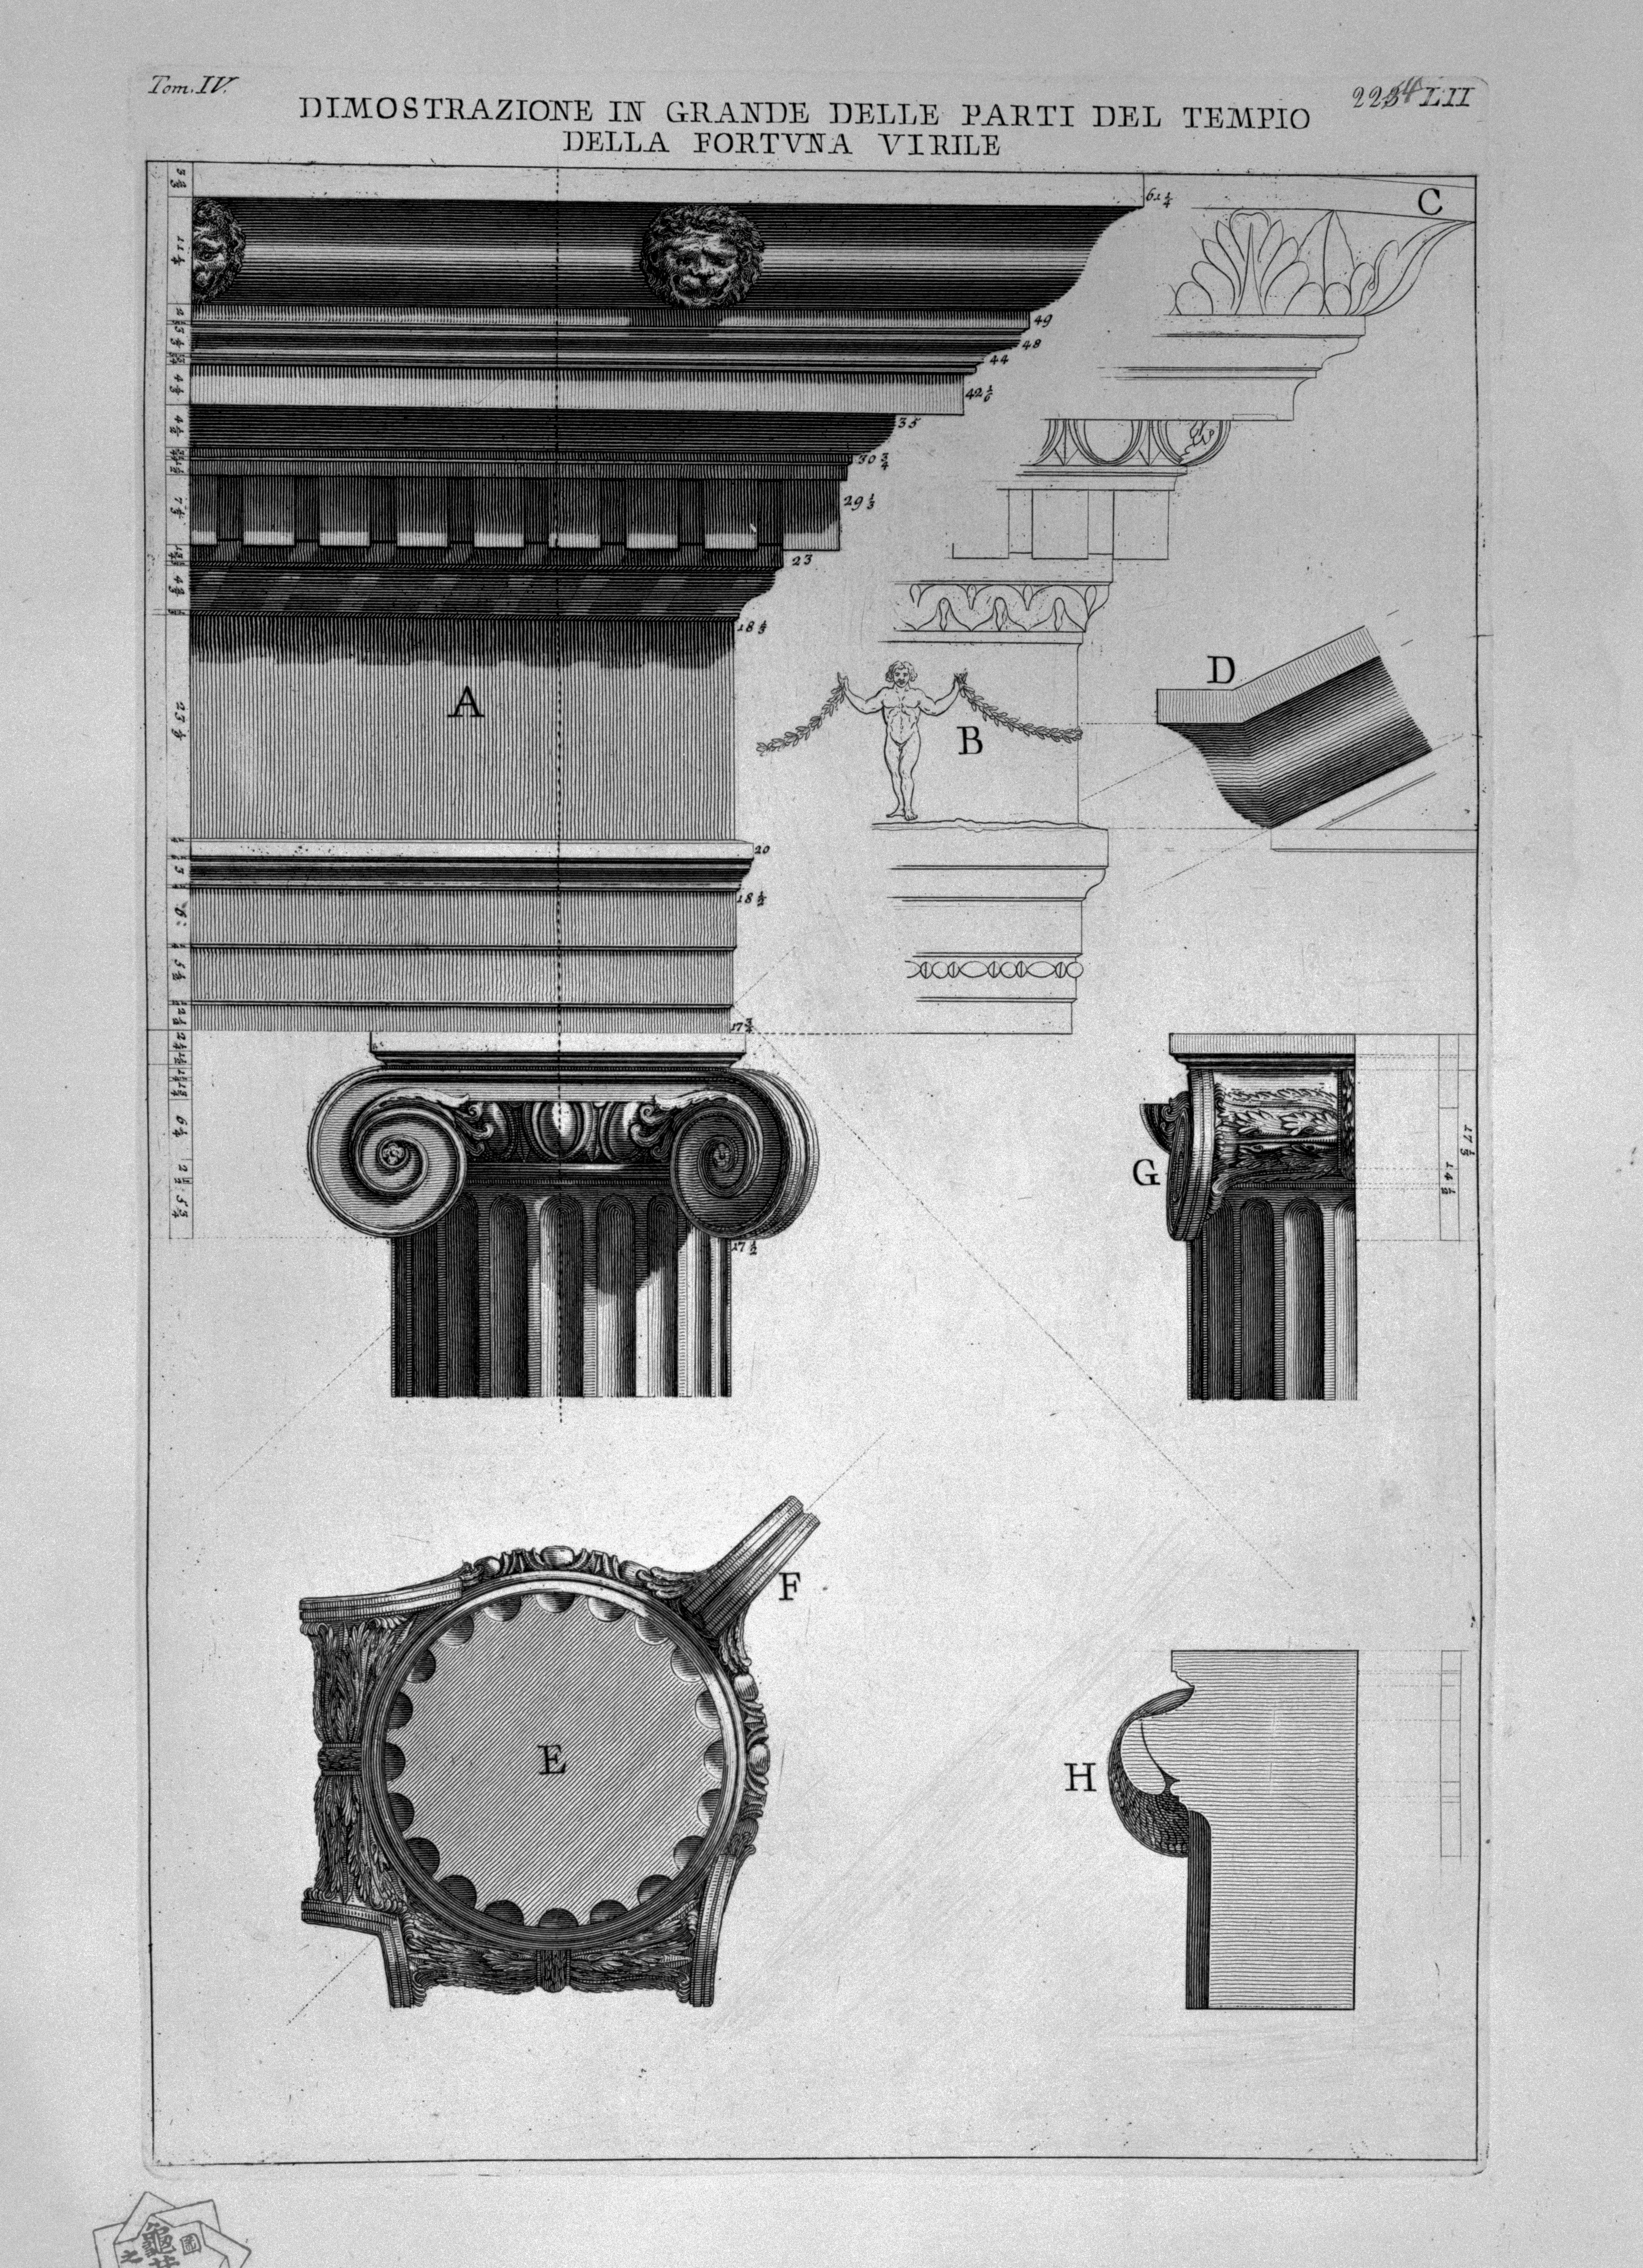 Corinthian Order Drawing Drawing by Piranesi of The